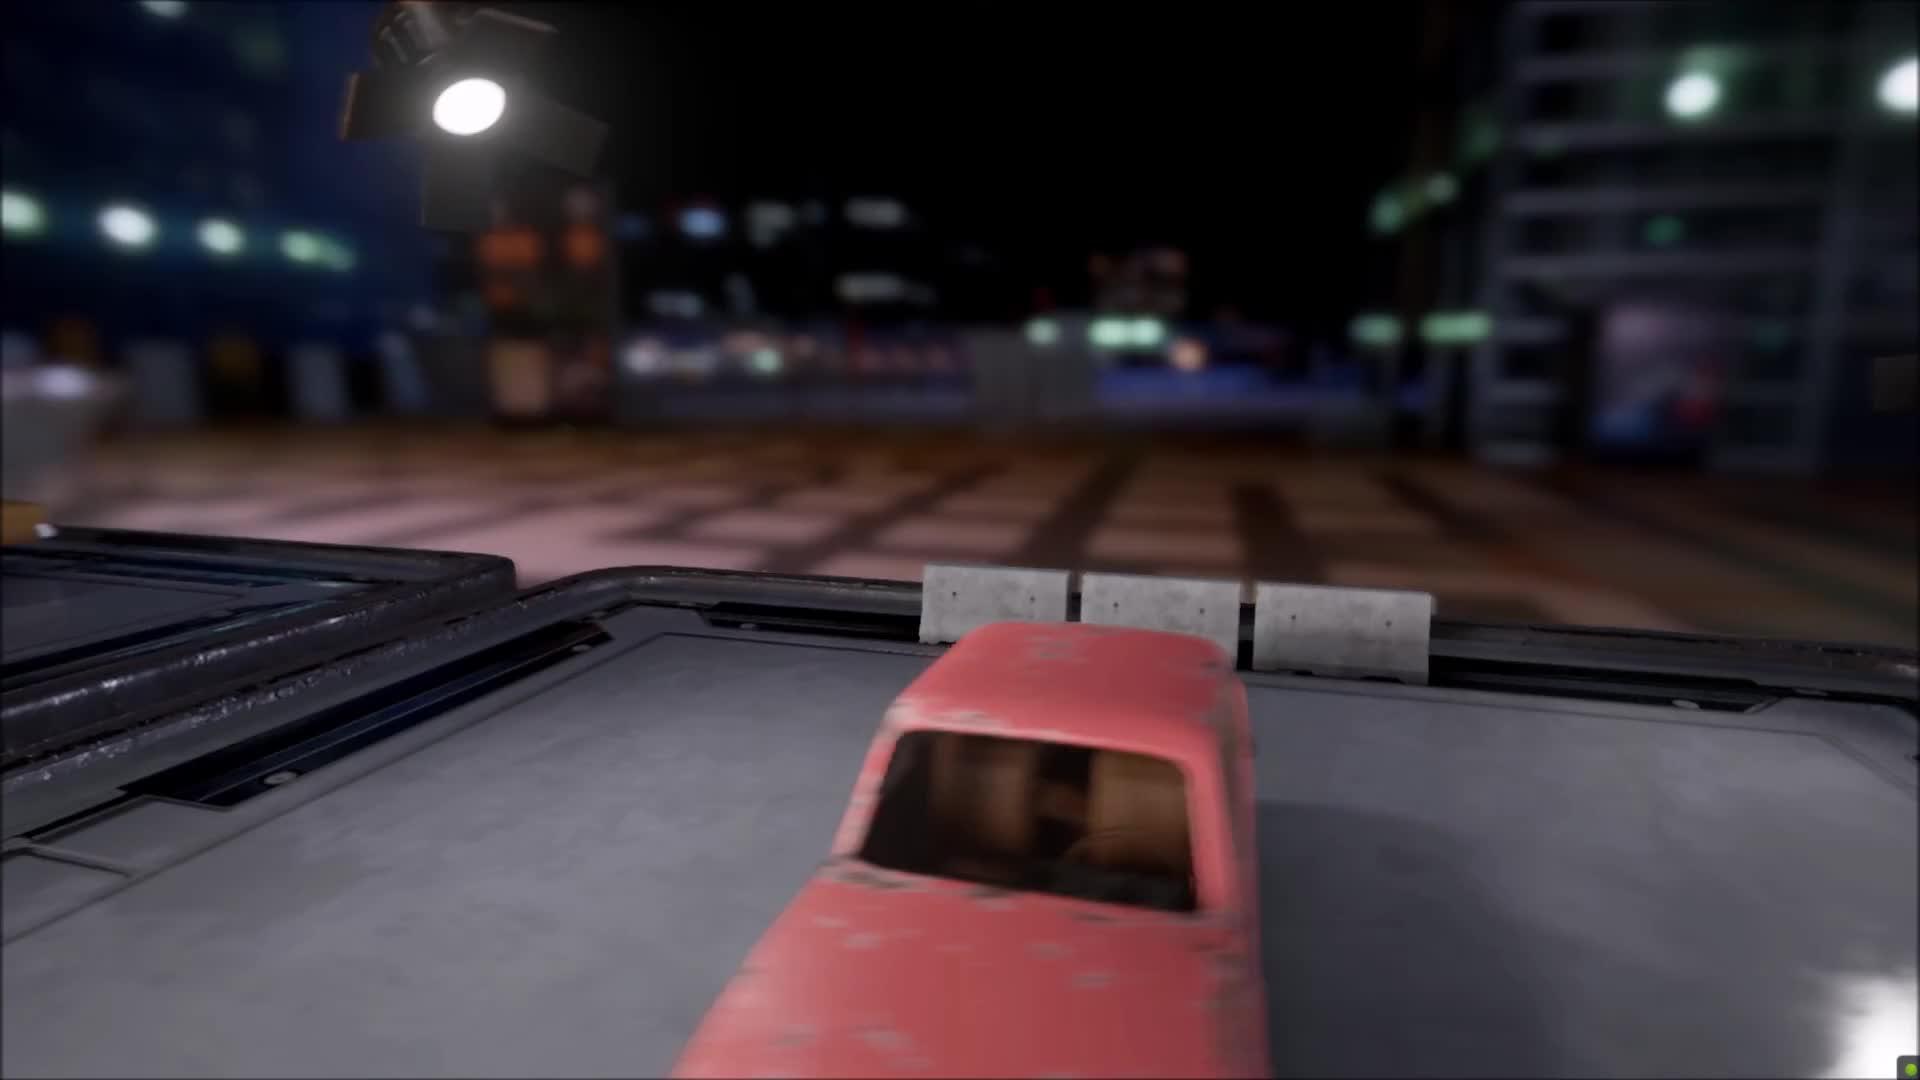 Car Destruction in Unreal Engine Video Watch at Y8